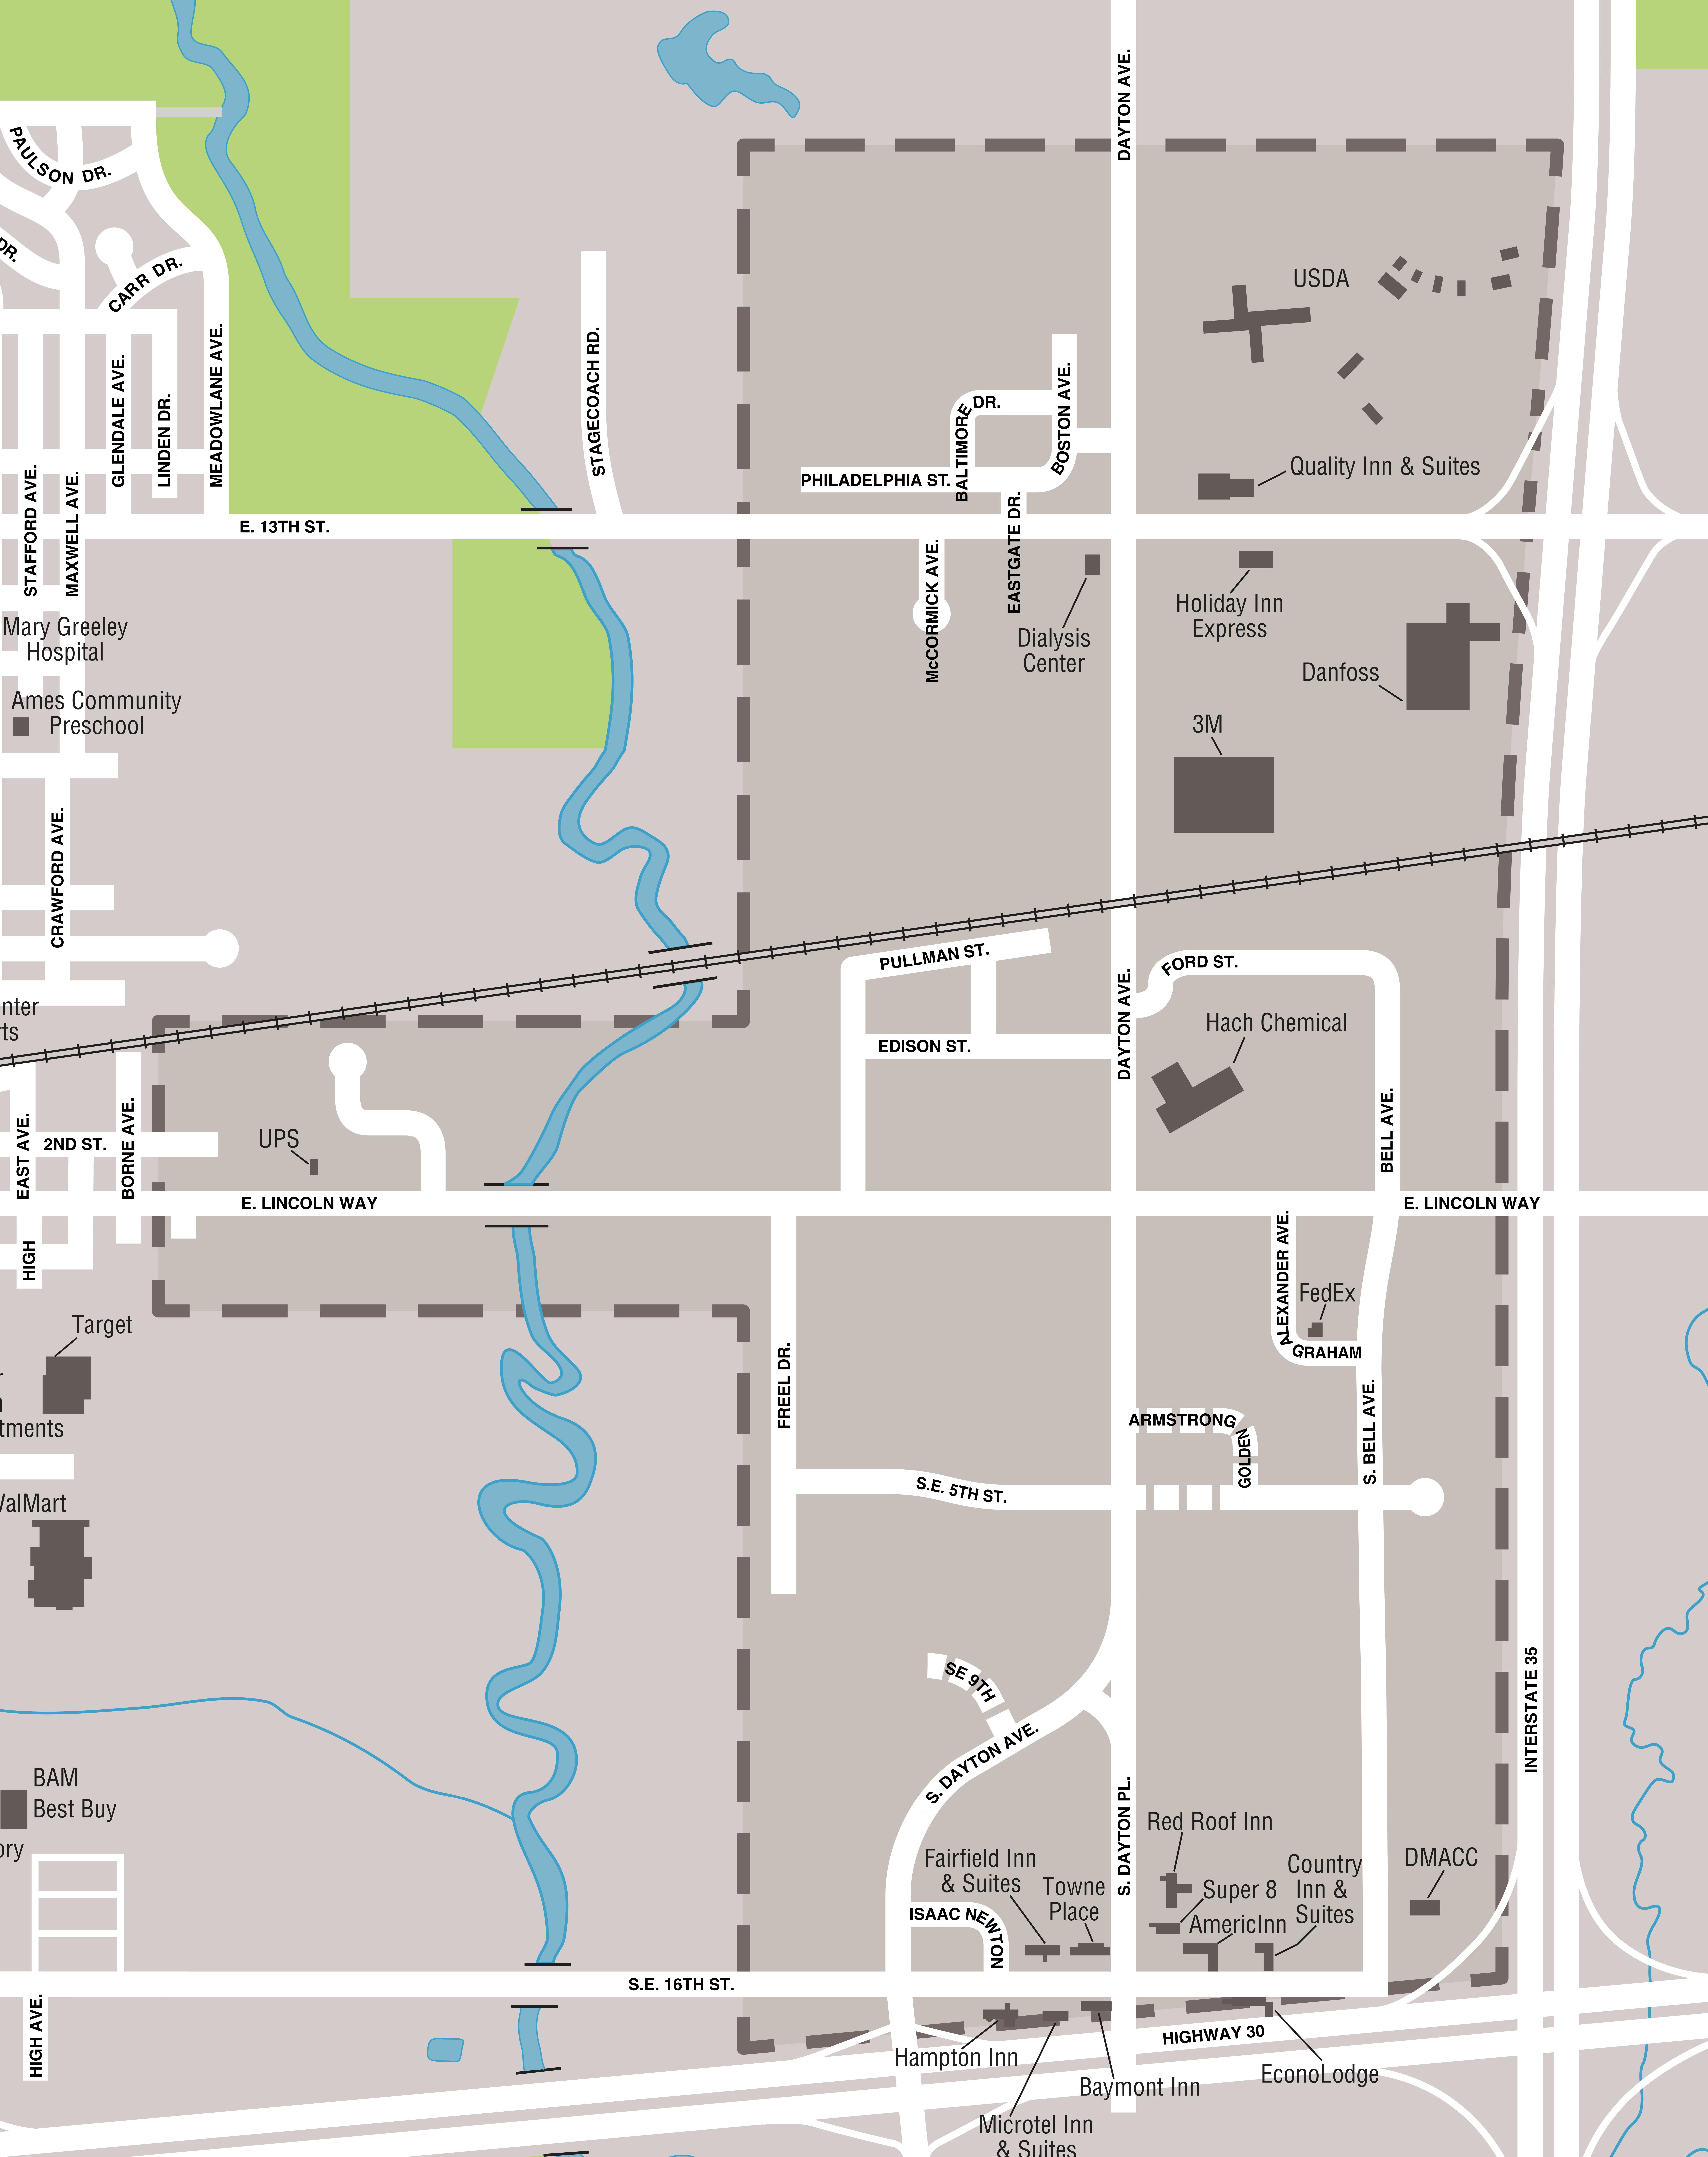 Year 2019-2020 Maps | CyRide on city of iowa campus map, lake delhi ia map, isu campus map, north carolina a&t campus map, ia state amtrak map, iowa university map, iowa state map, gardner webb campus map,